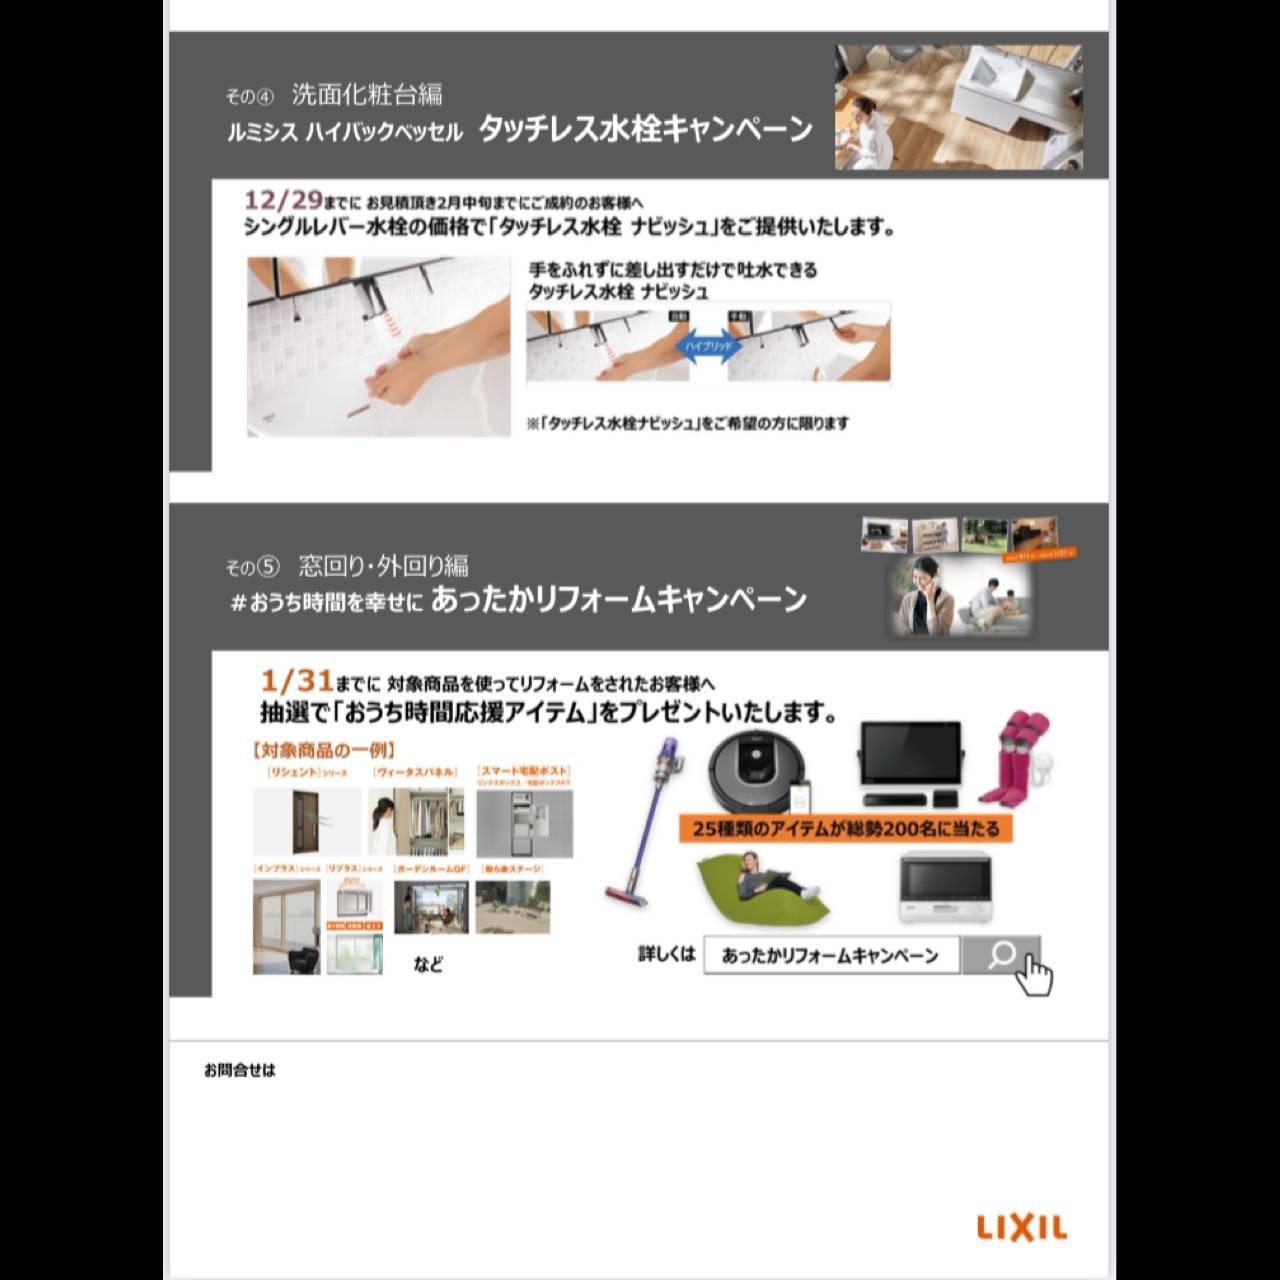 LIXIL  お得なキャンペーン  まとめてご紹介☆ 原口建材店 熊本のイベントキャンペーン 写真2